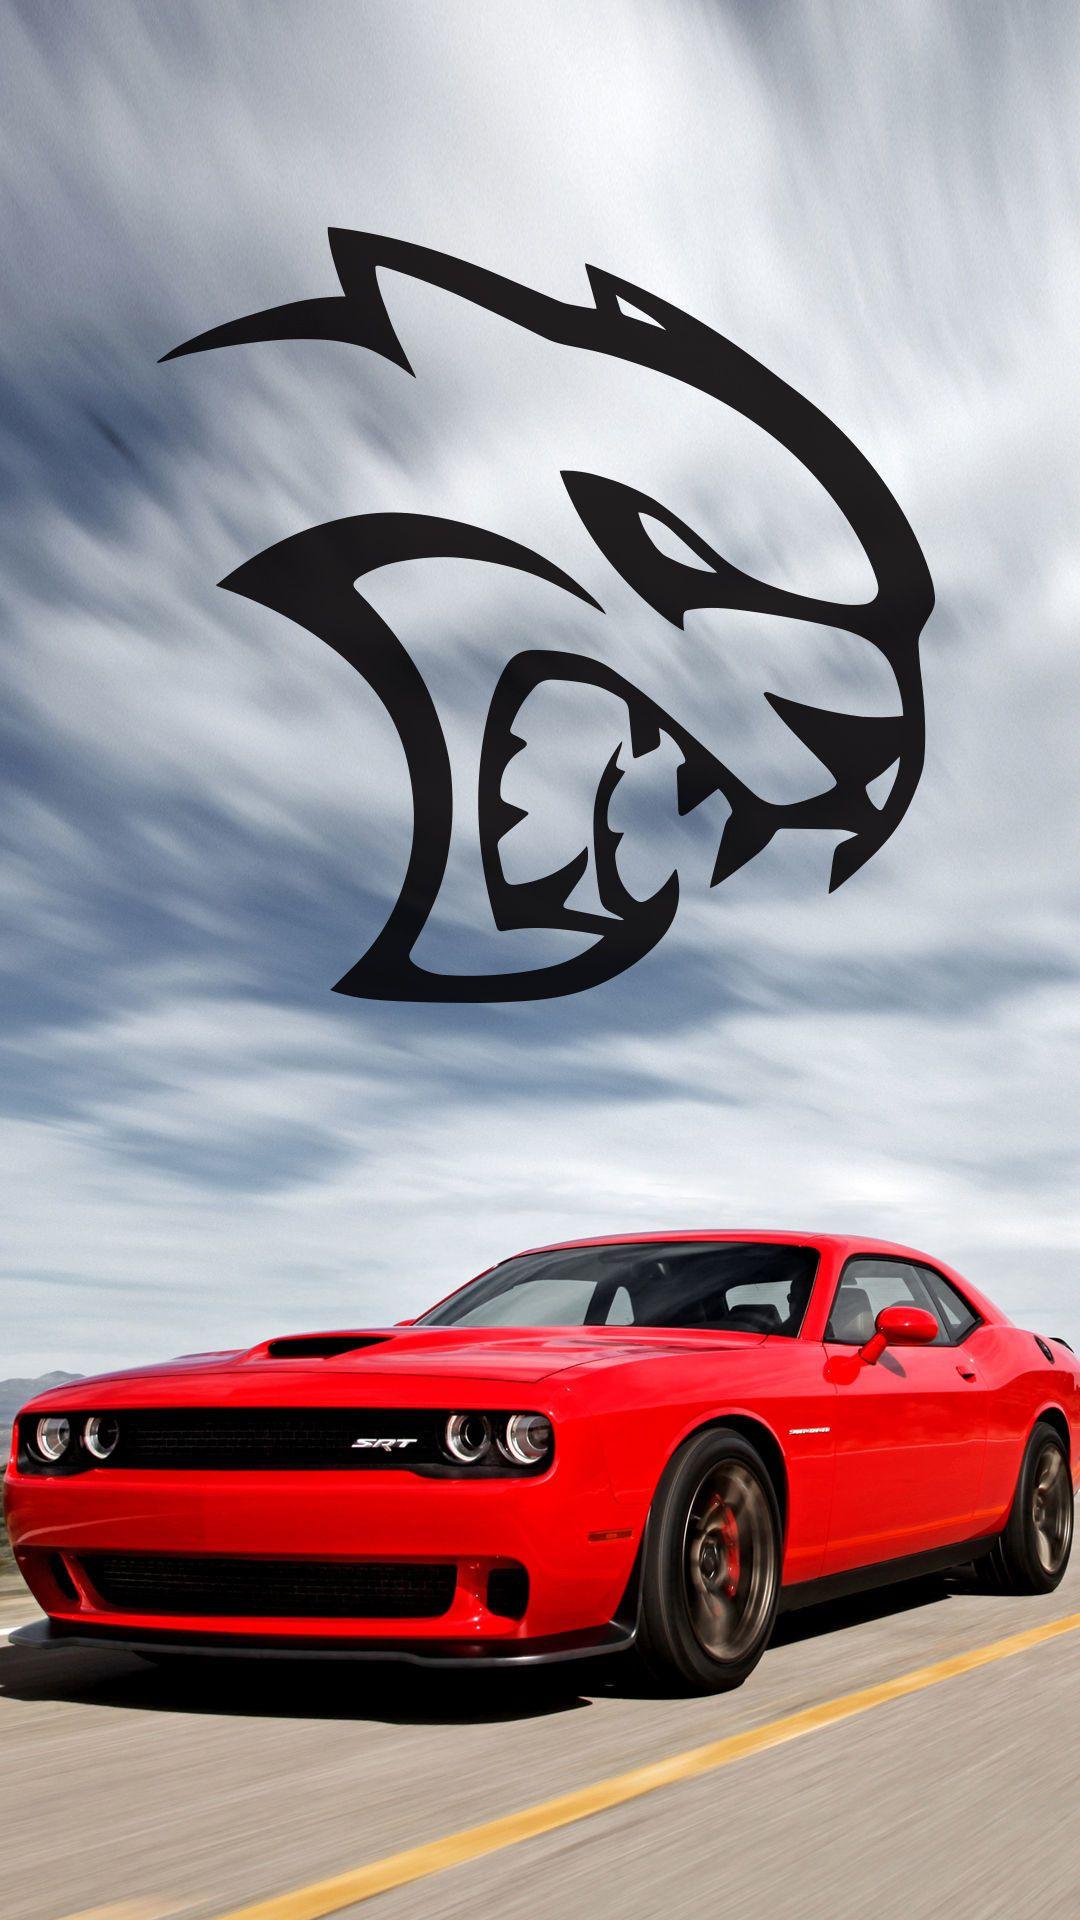 1080x1920 2015 Hellcat Dodge Challenger Iphone Wallpaper Dodge Challenger Hellcat Dodge Challenger Dodge Challenger Srt Hellcat